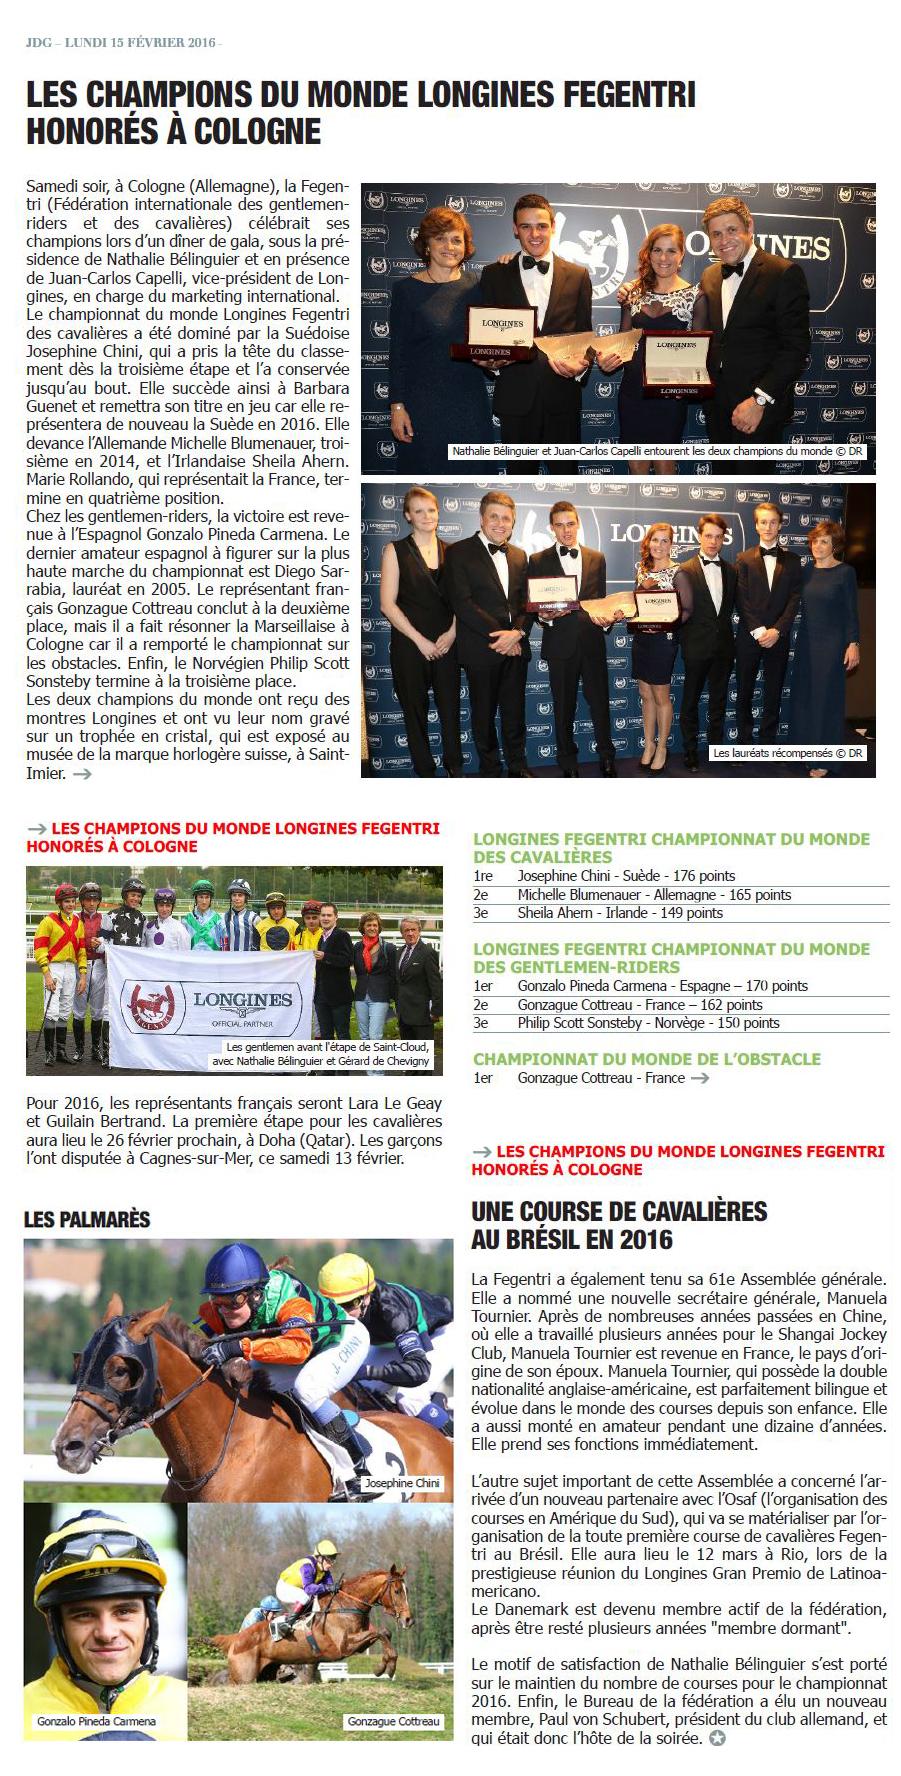 JDP_Les-Champions-du-Monde-Longines-Fegentri_16.02.2015